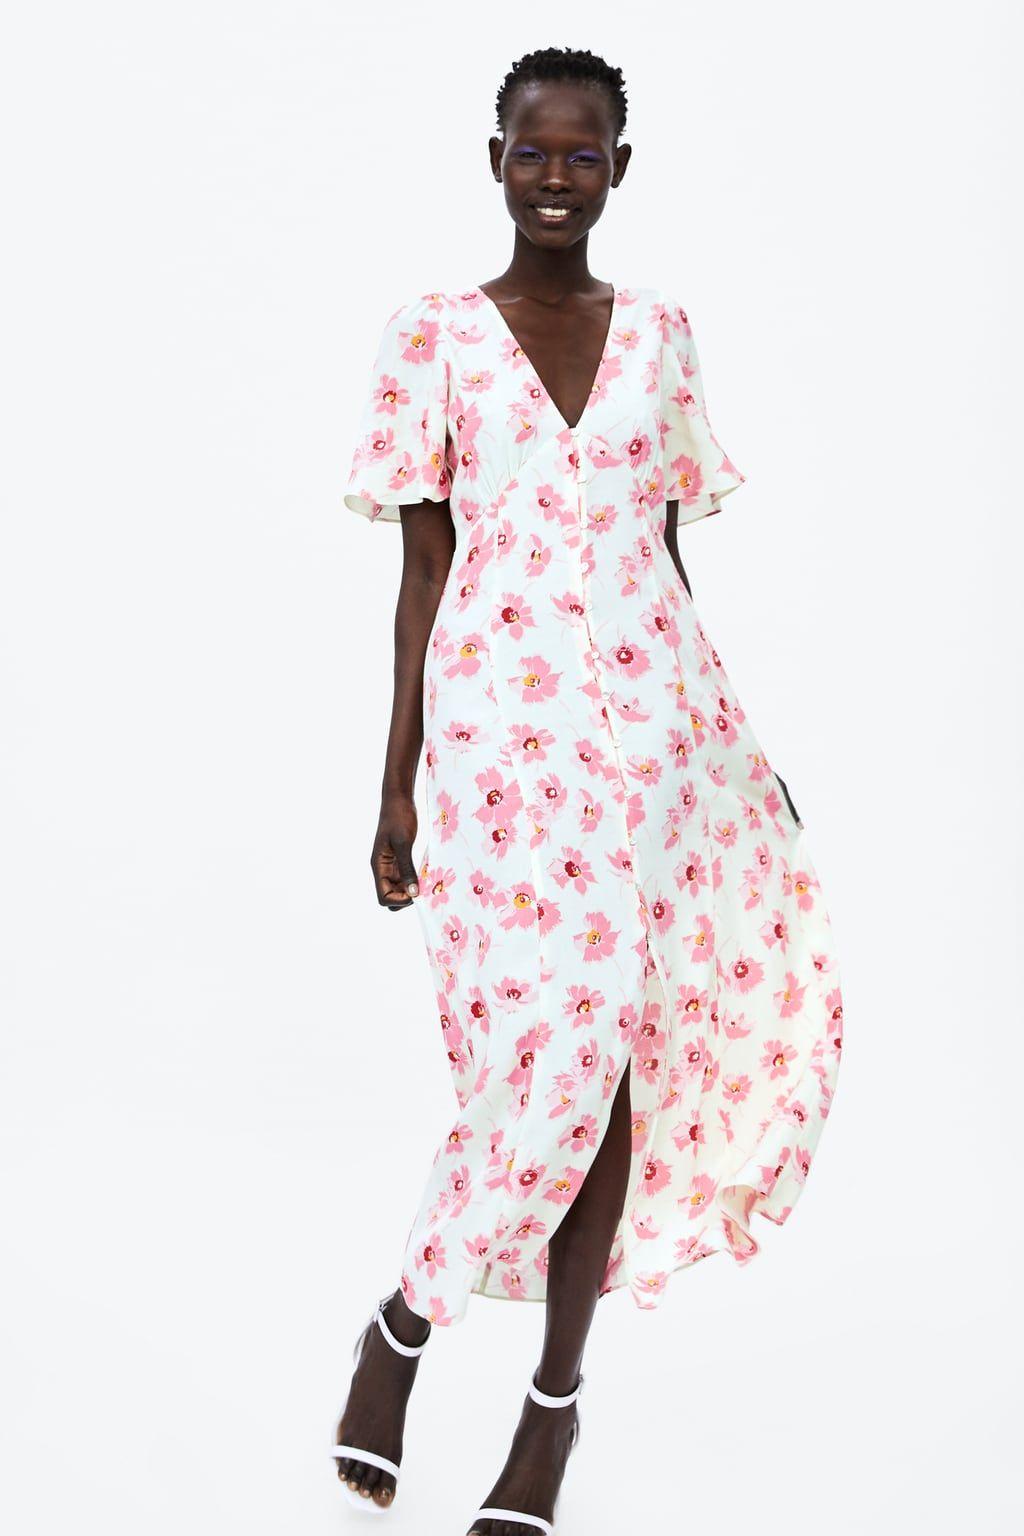 Floral Print Dress View All Dress Time Woman Corner Shops Zara United States Floral Print Dress Print Dress Dresses [ 1536 x 1024 Pixel ]